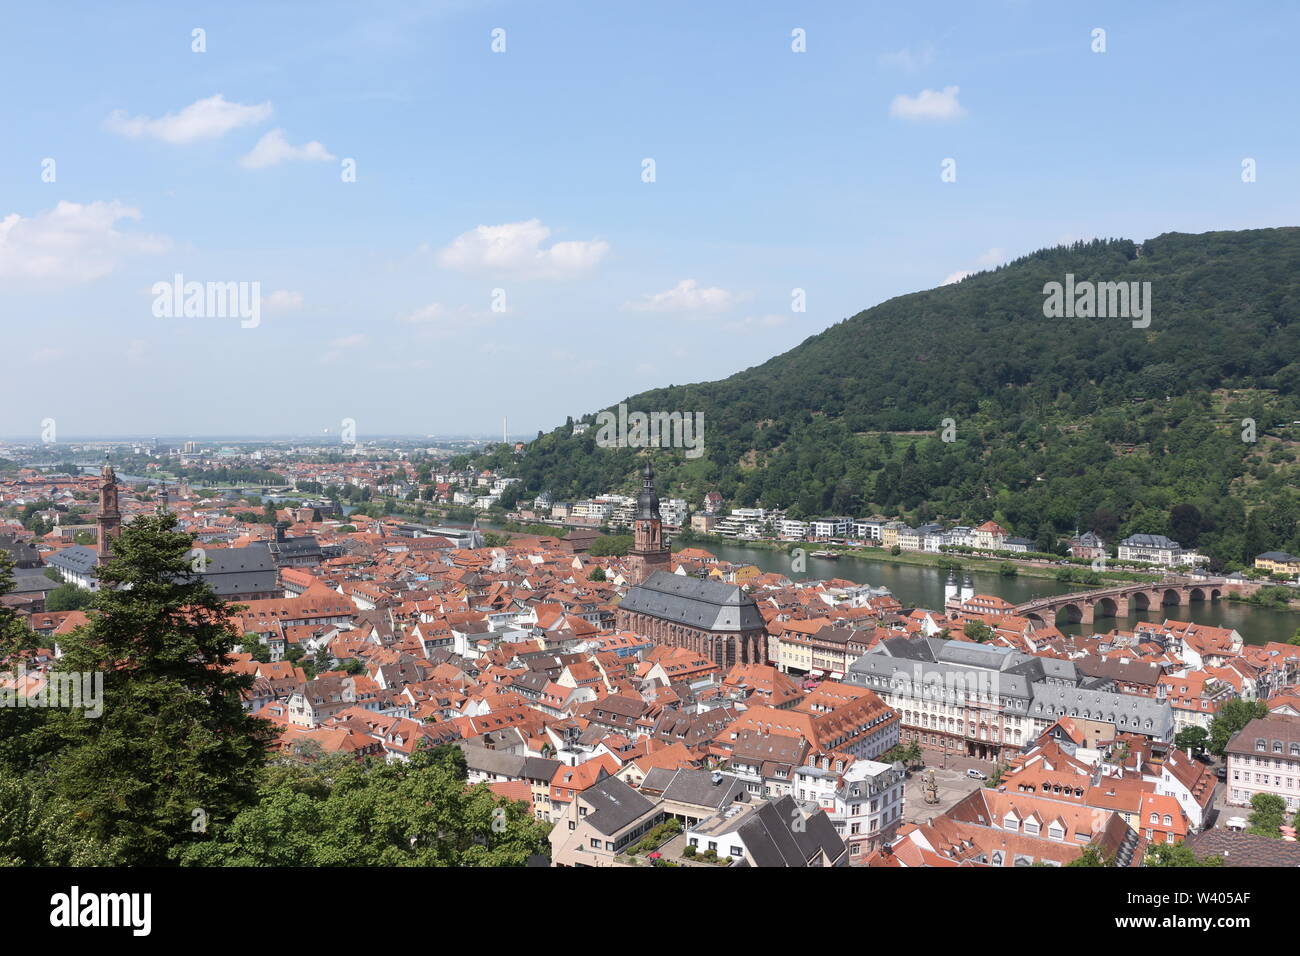 Blick über die Altstadt von Heidelberg - Stock Image